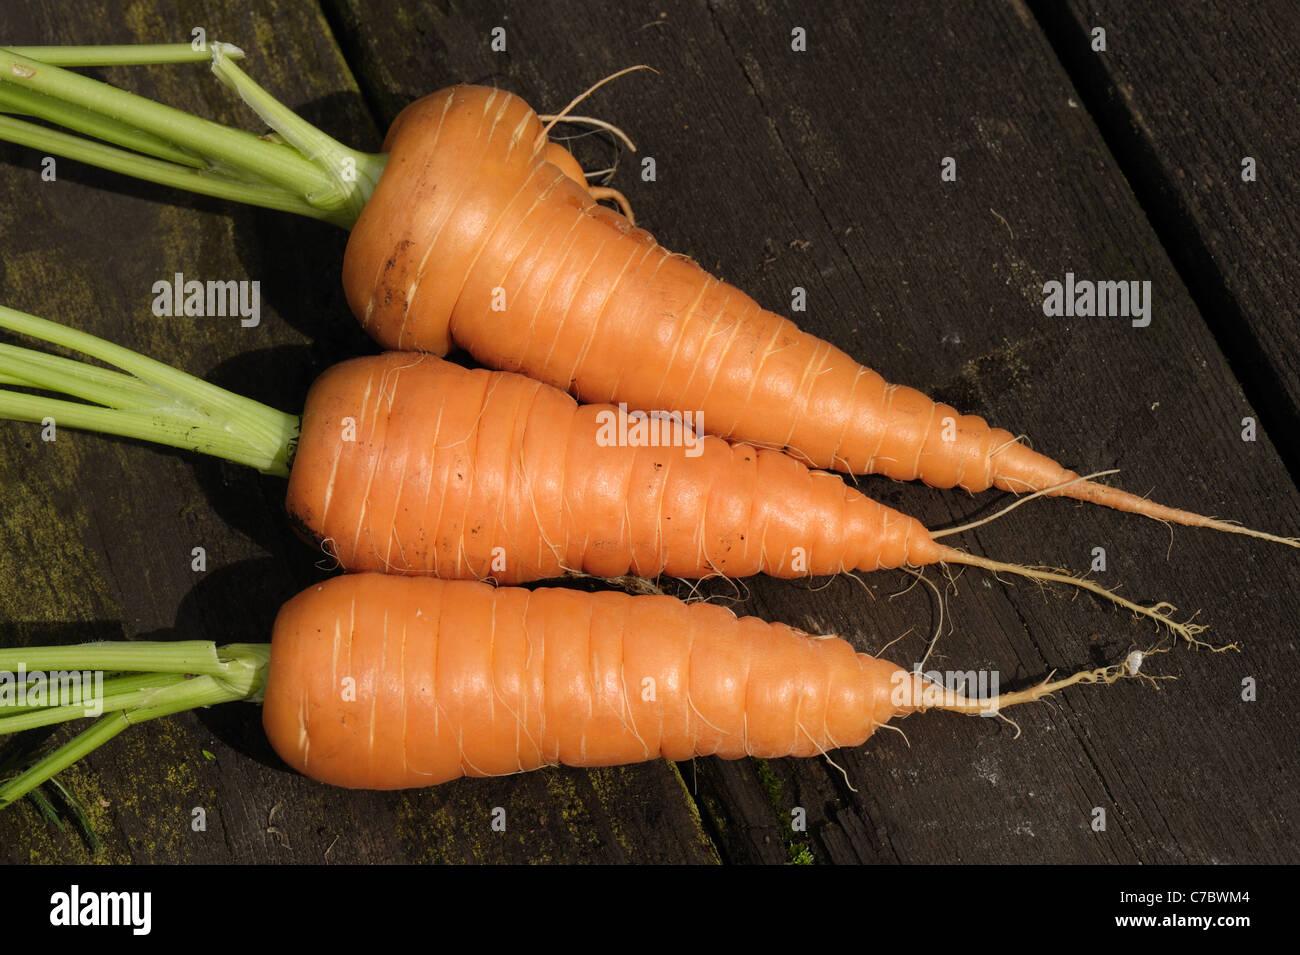 Reife Garten Container gewachsen Karotten Stockbild